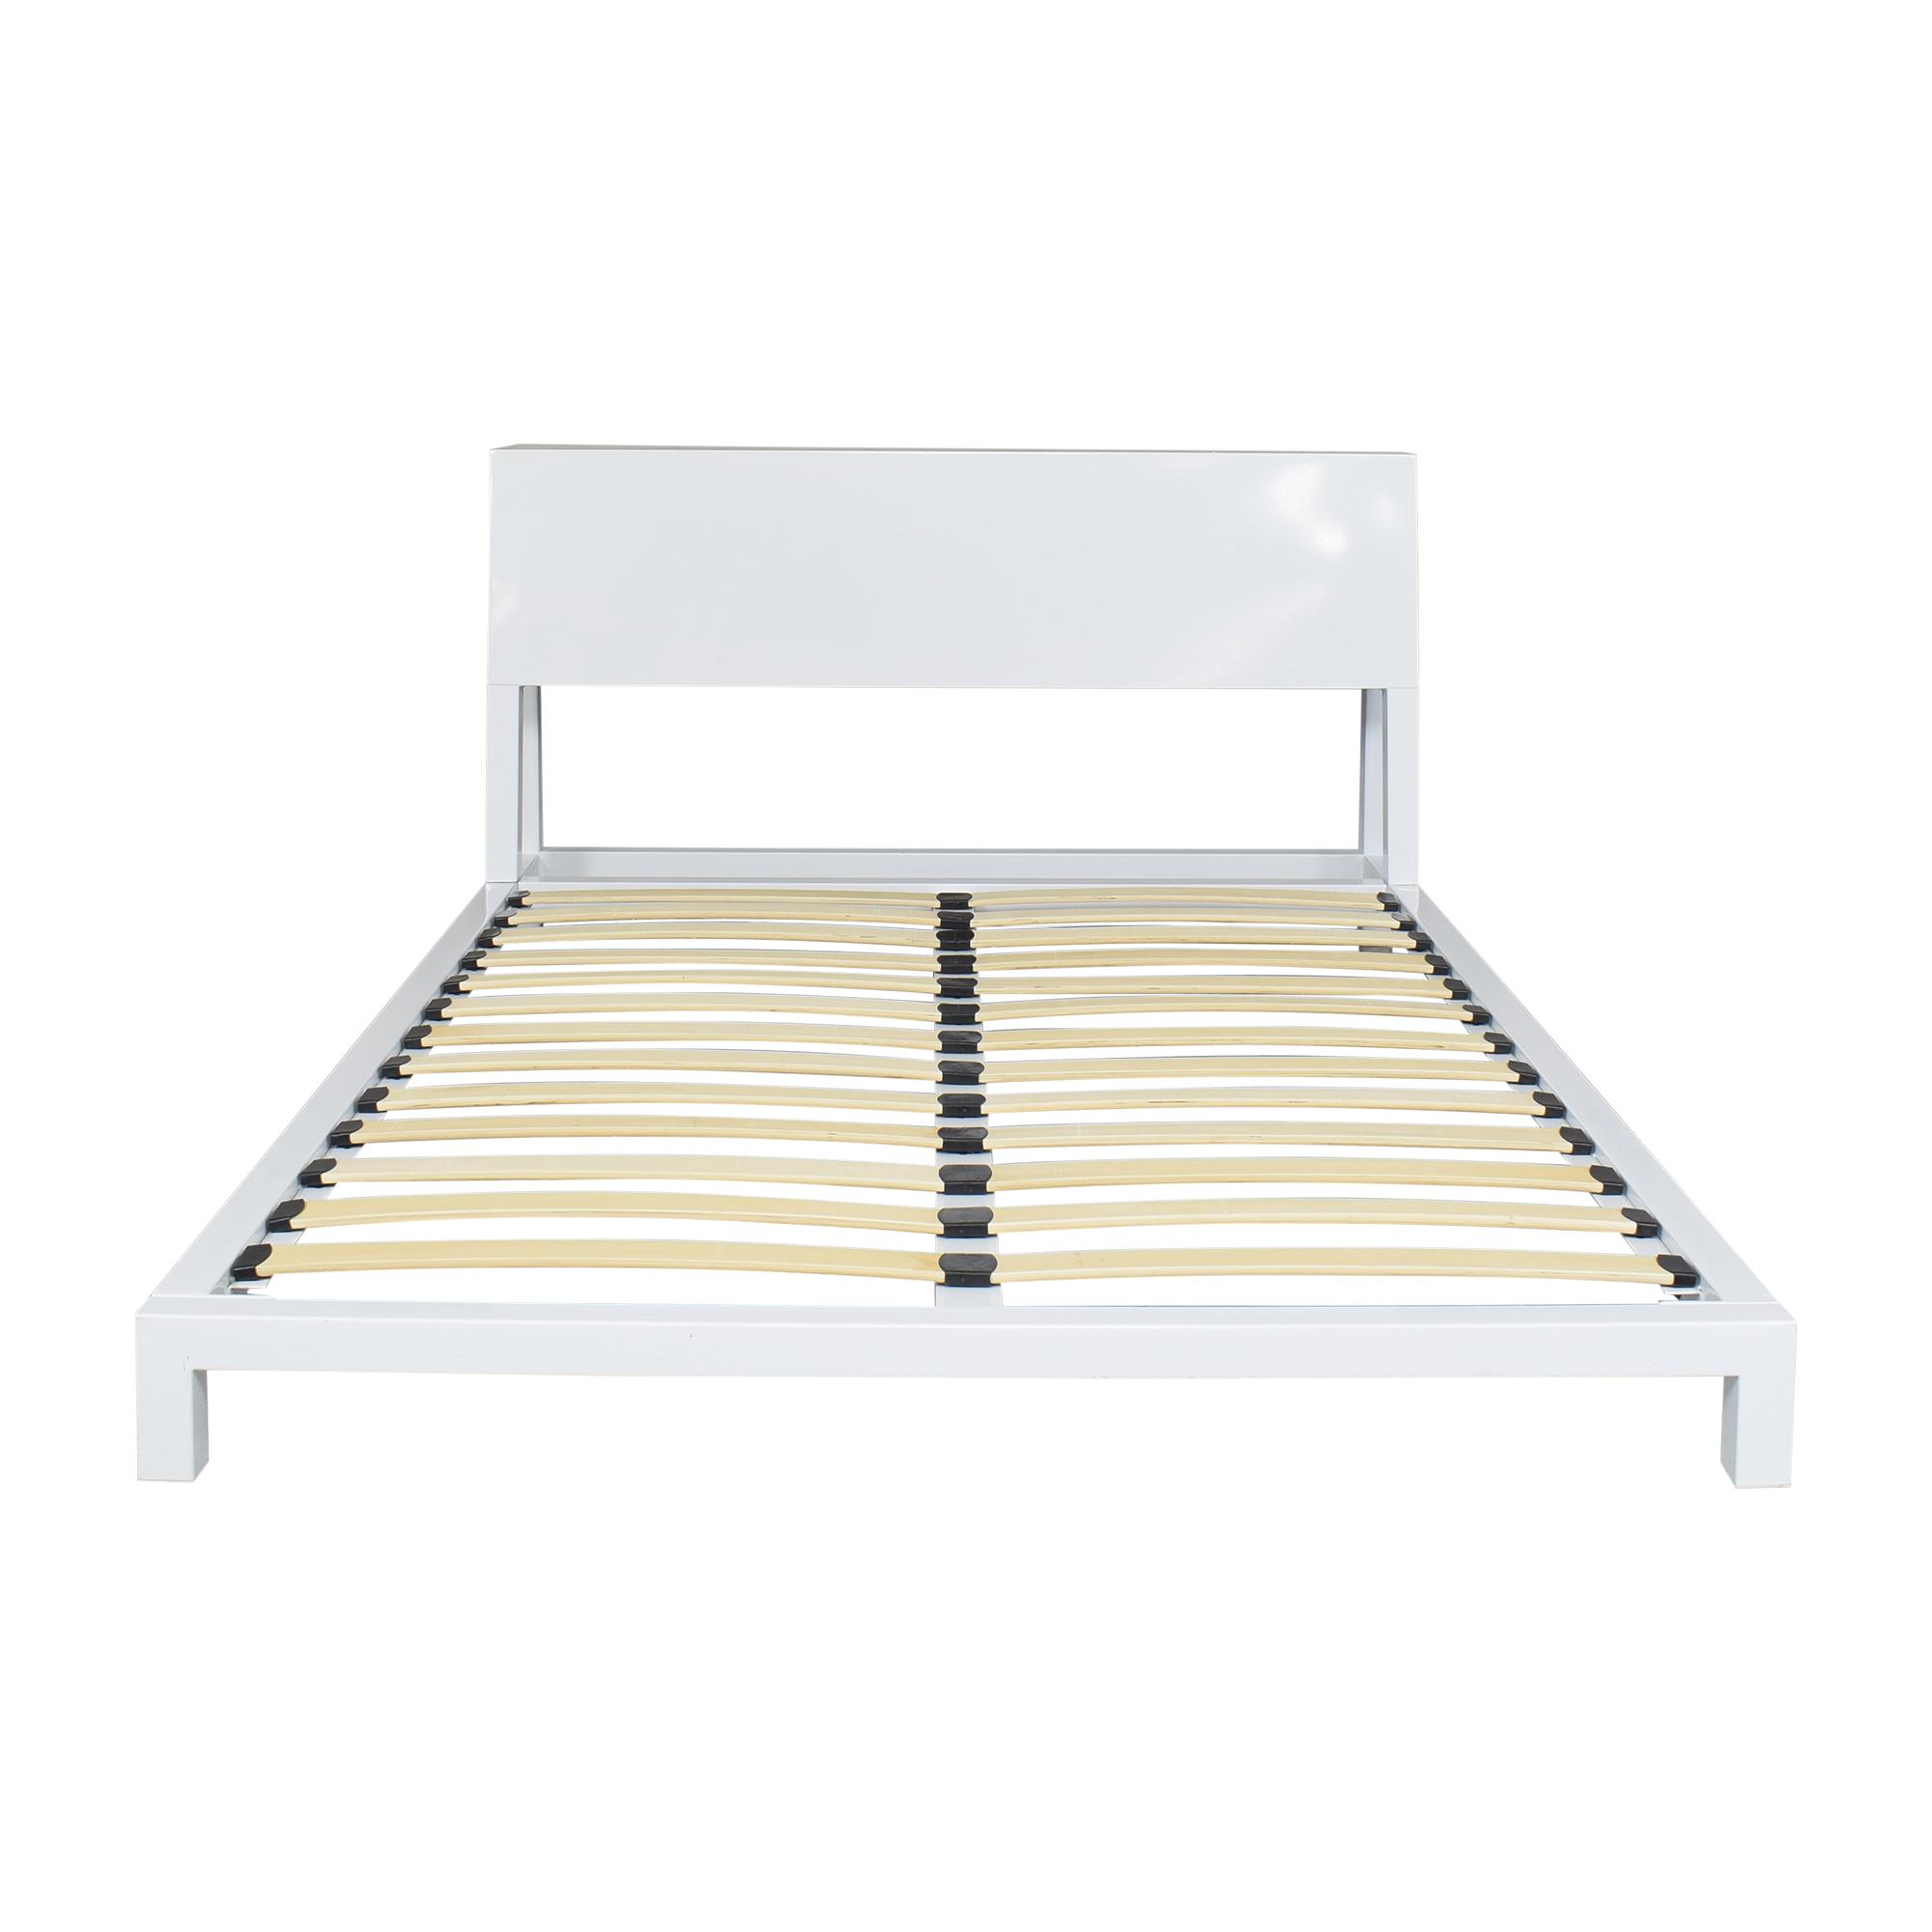 CB2 Alpine Full Bed / Bed Frames